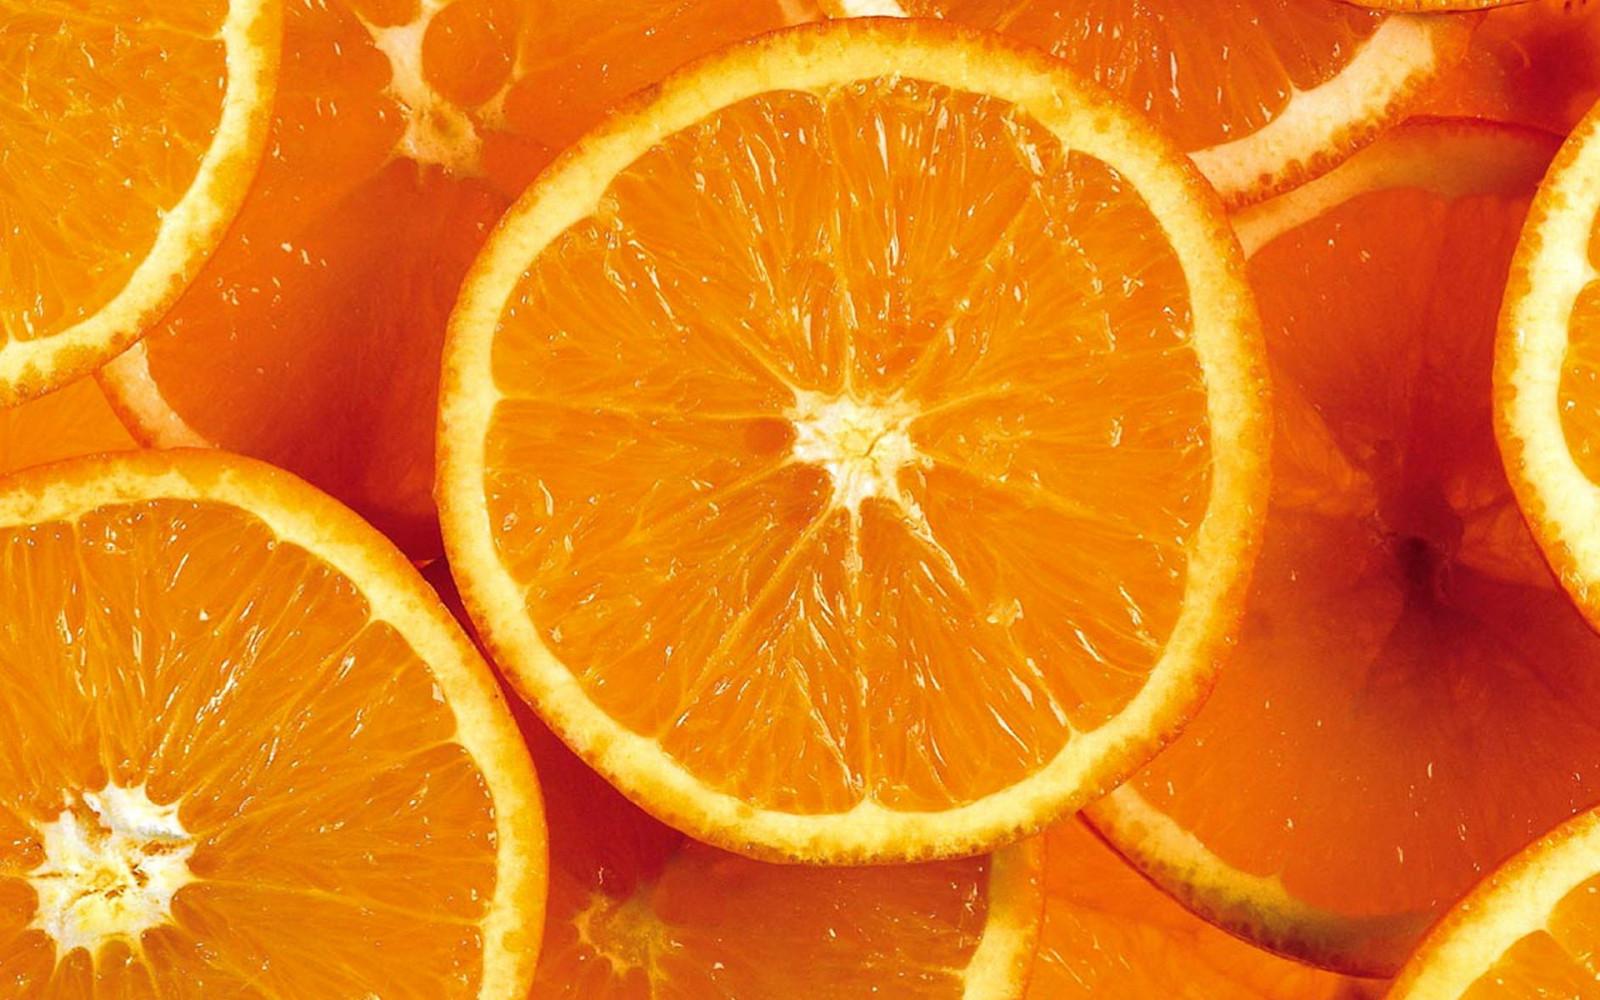 1920x1200 px, food, fruits, orange, oranges, slices